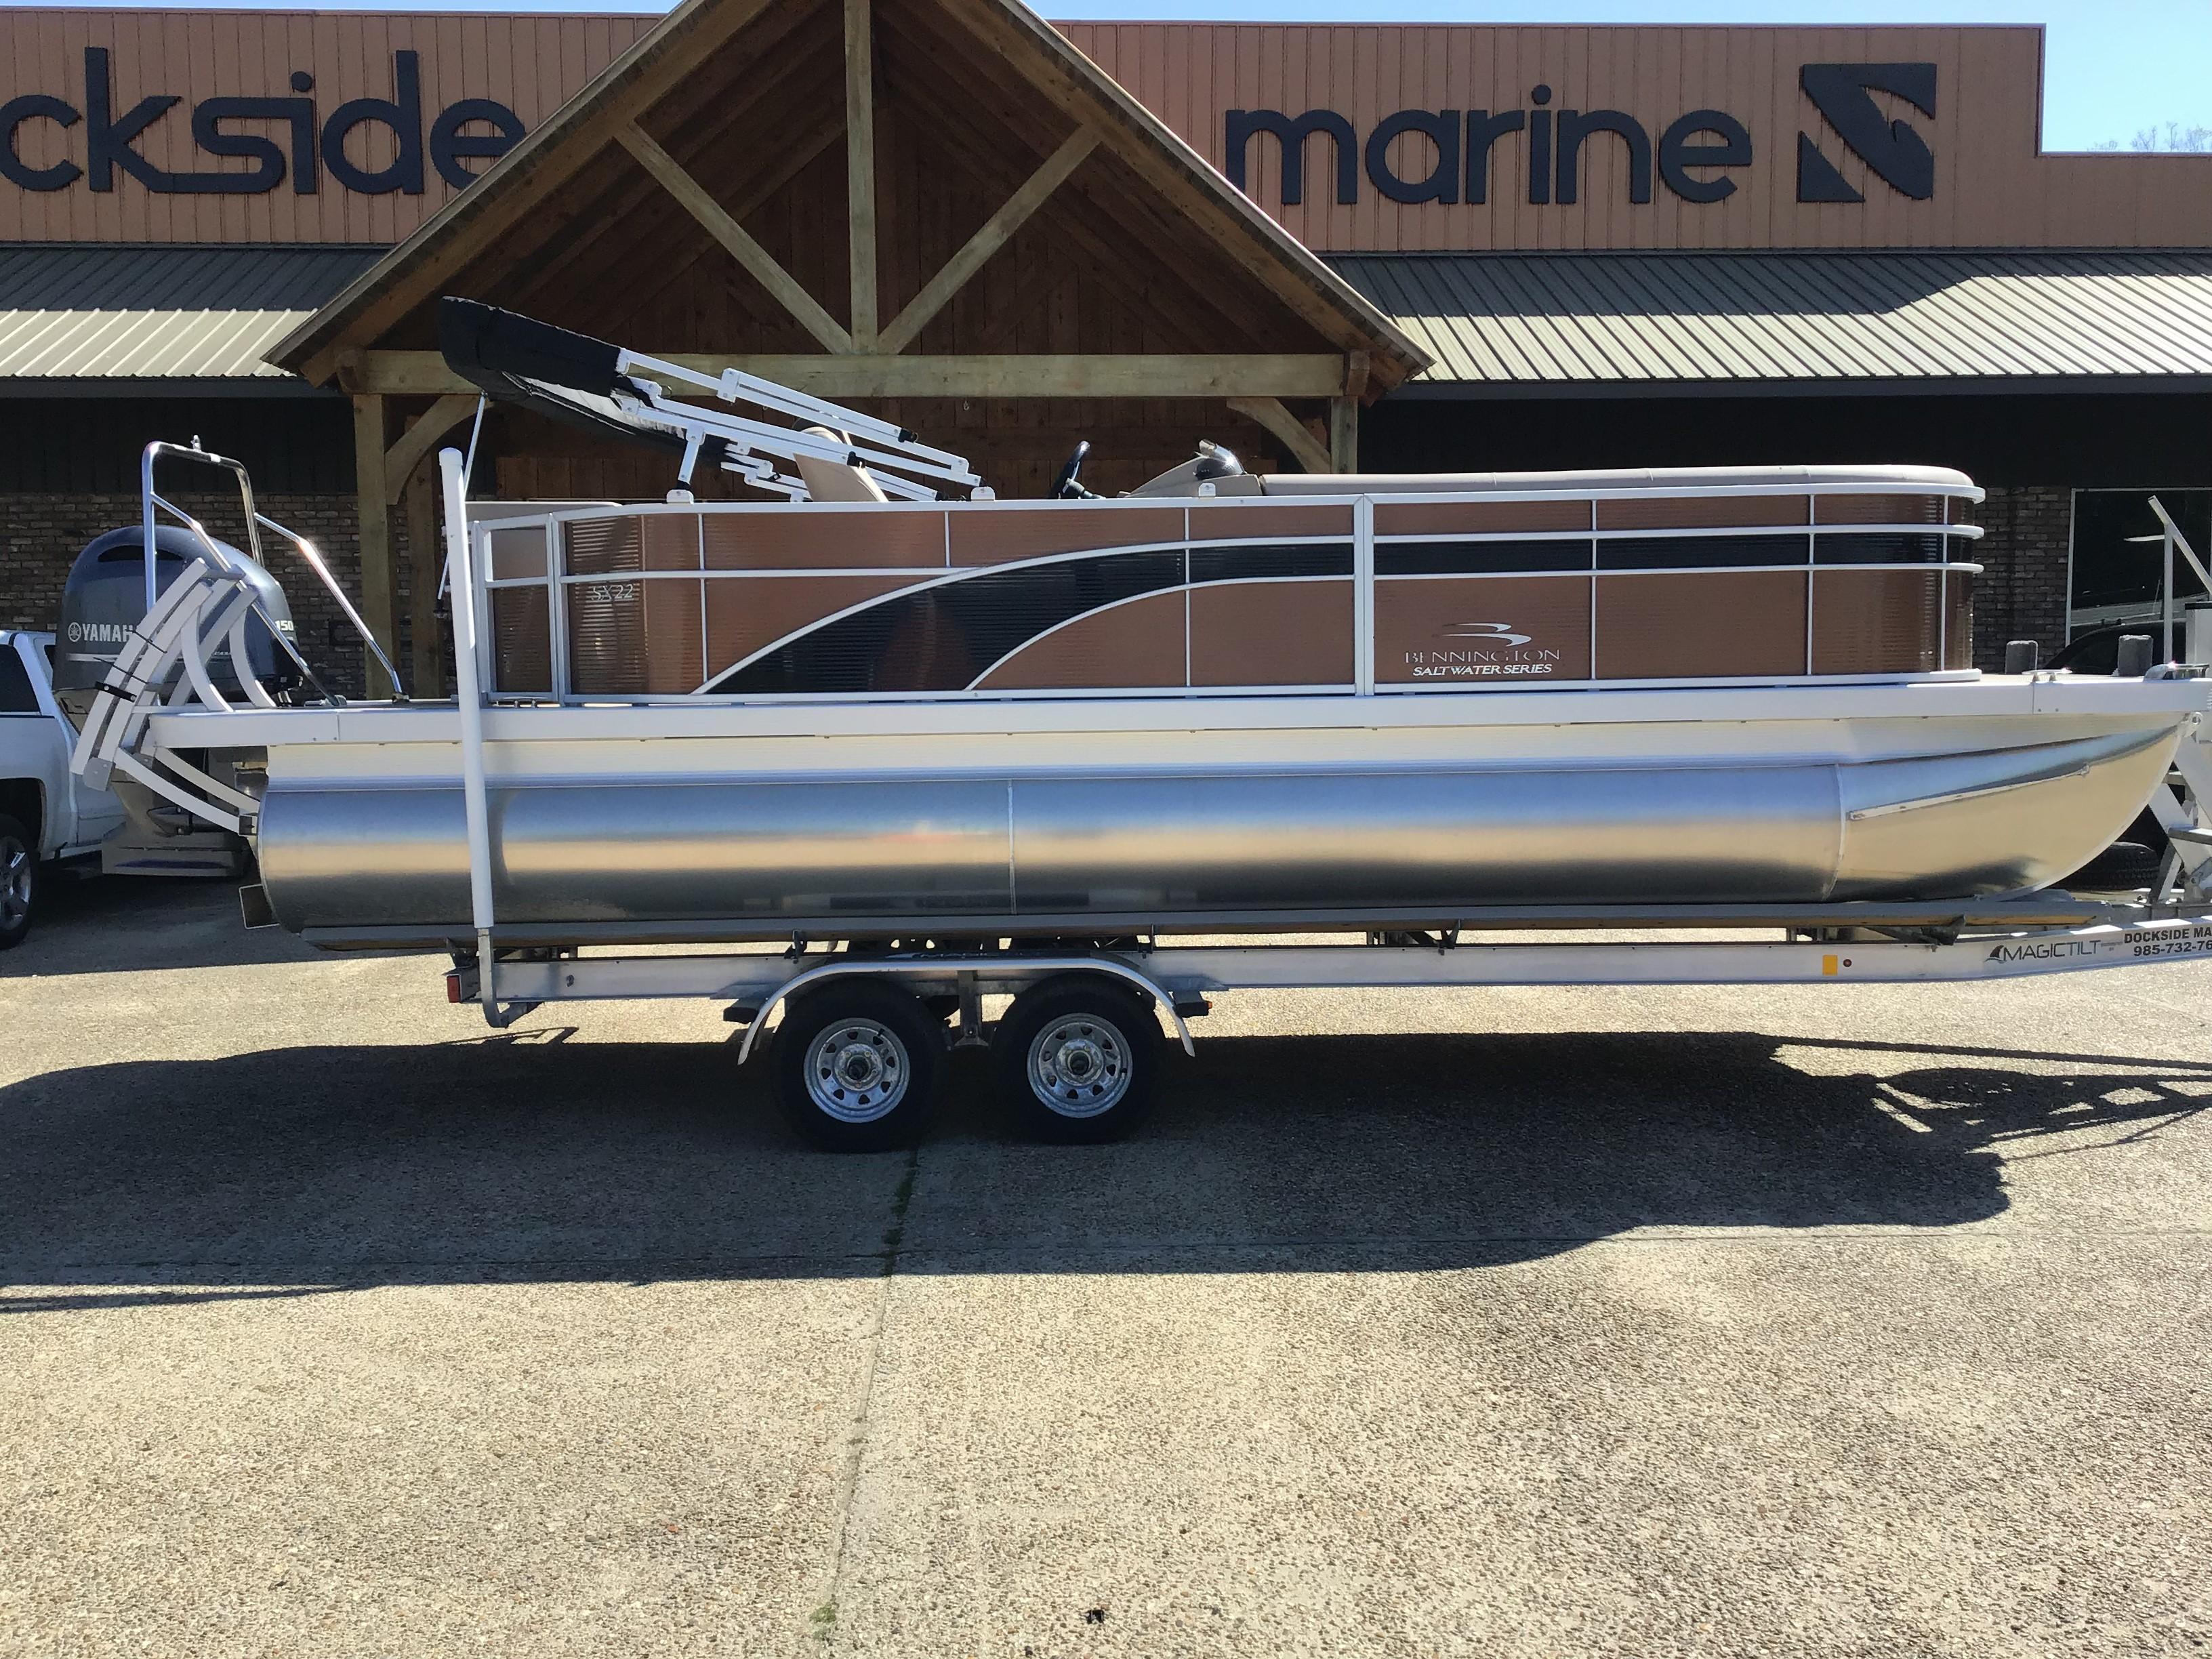 New Bennington 22 S Cruise Boats For Sale - Dockside Marine